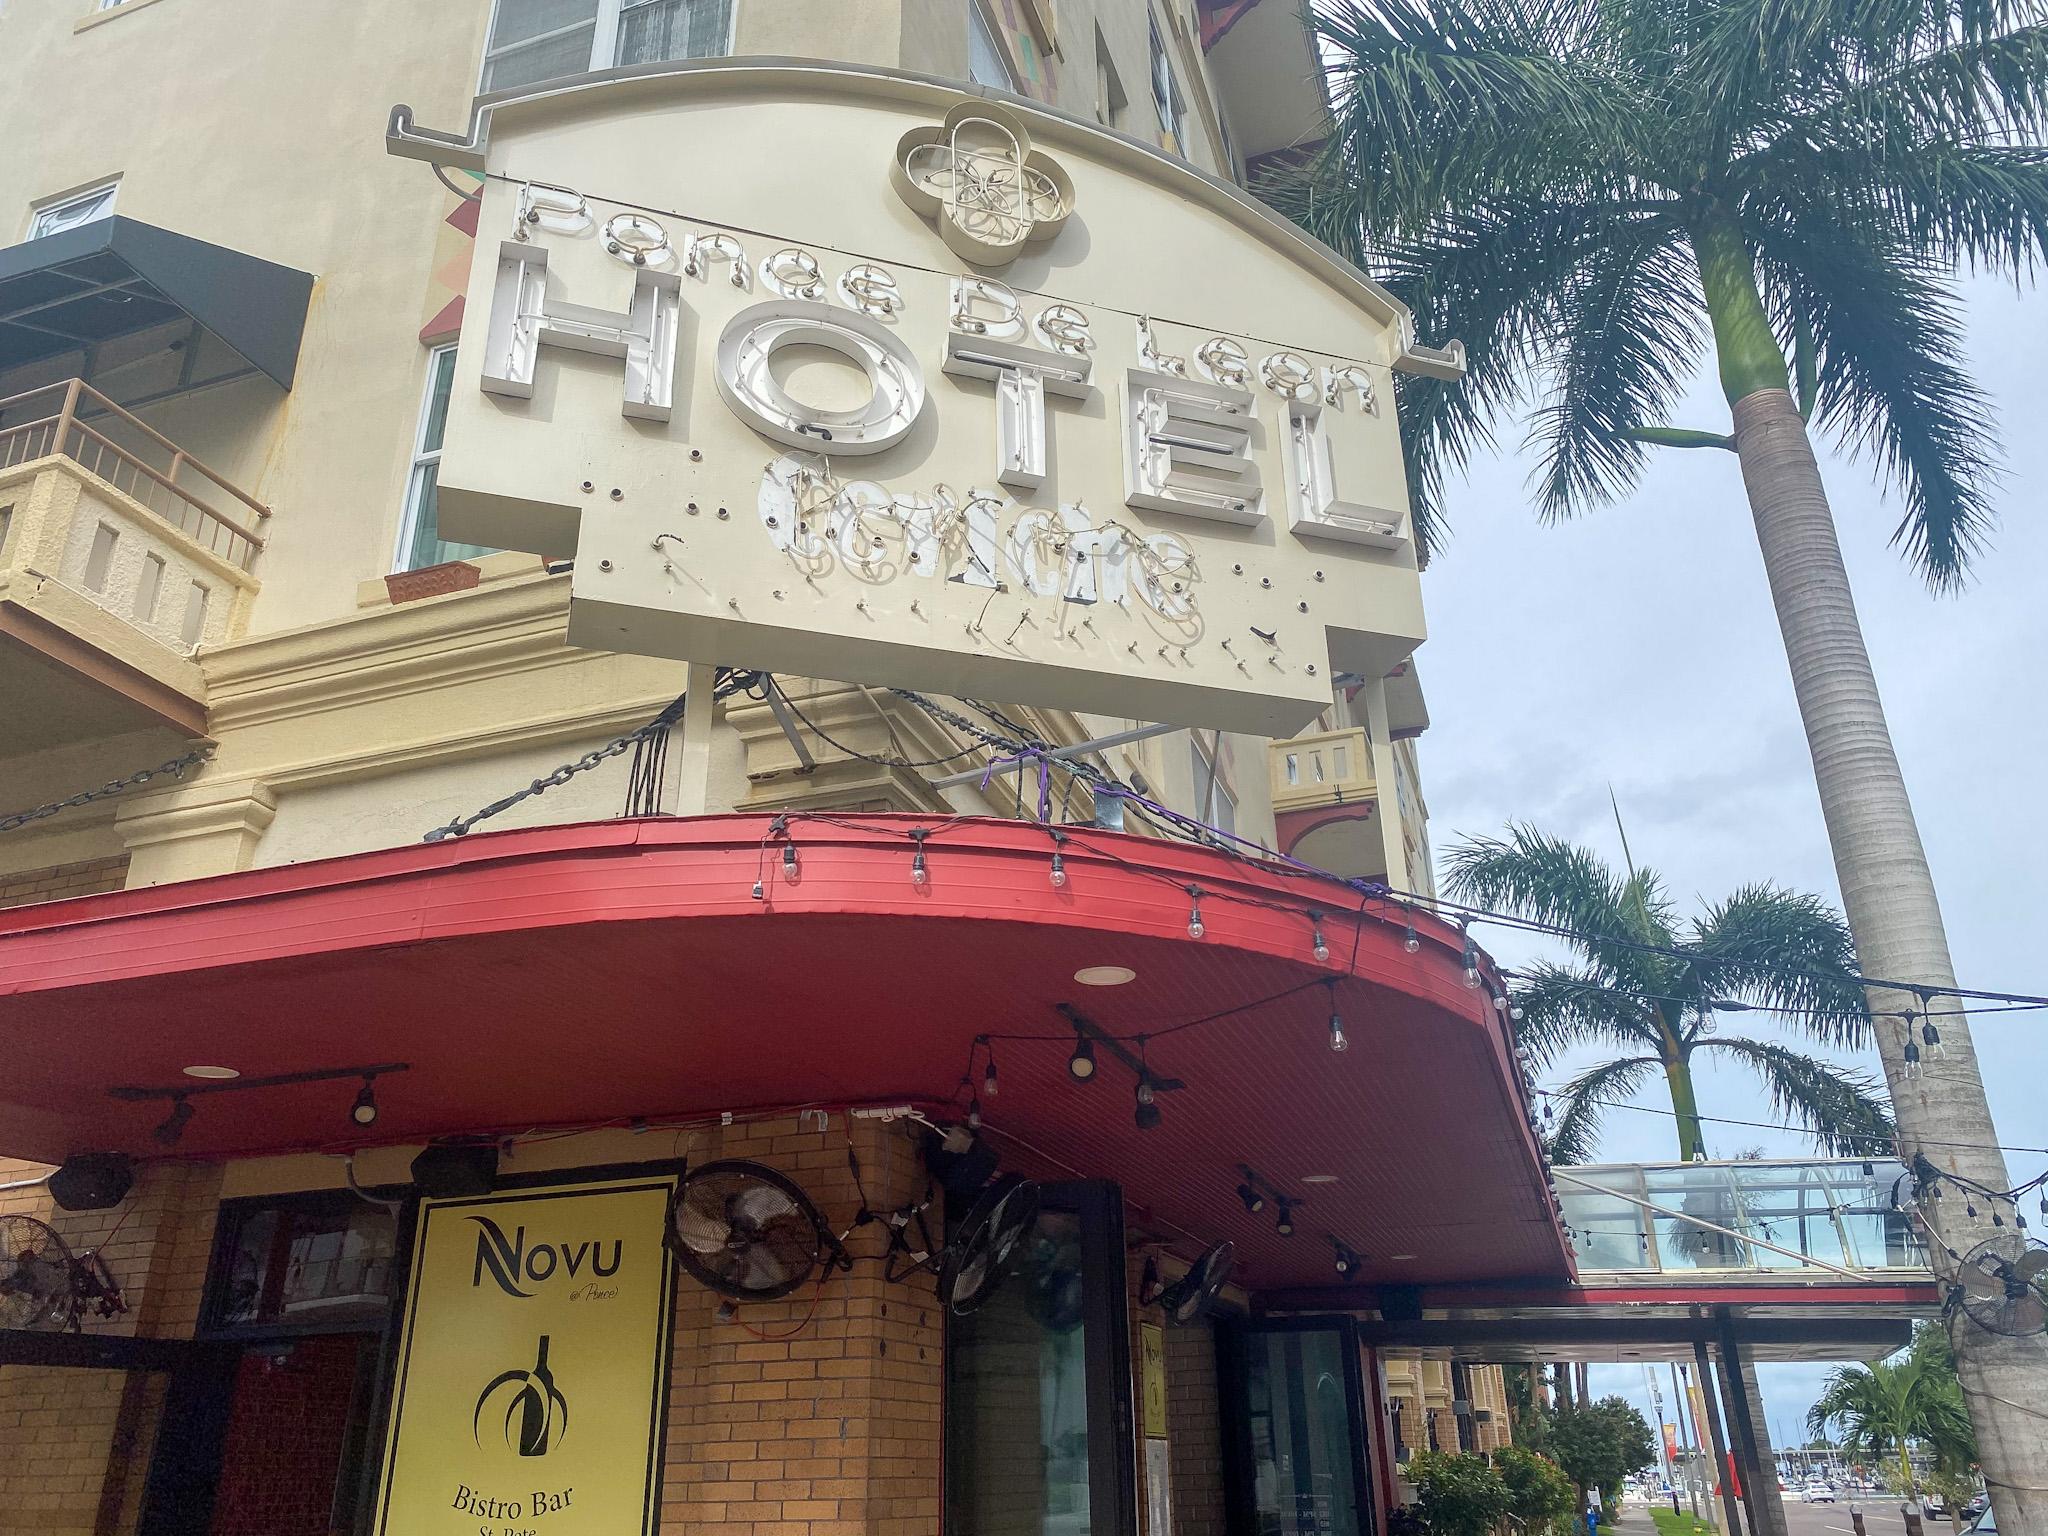 Novu Bistro Bar - next to the historic Ponce de Leon hotel